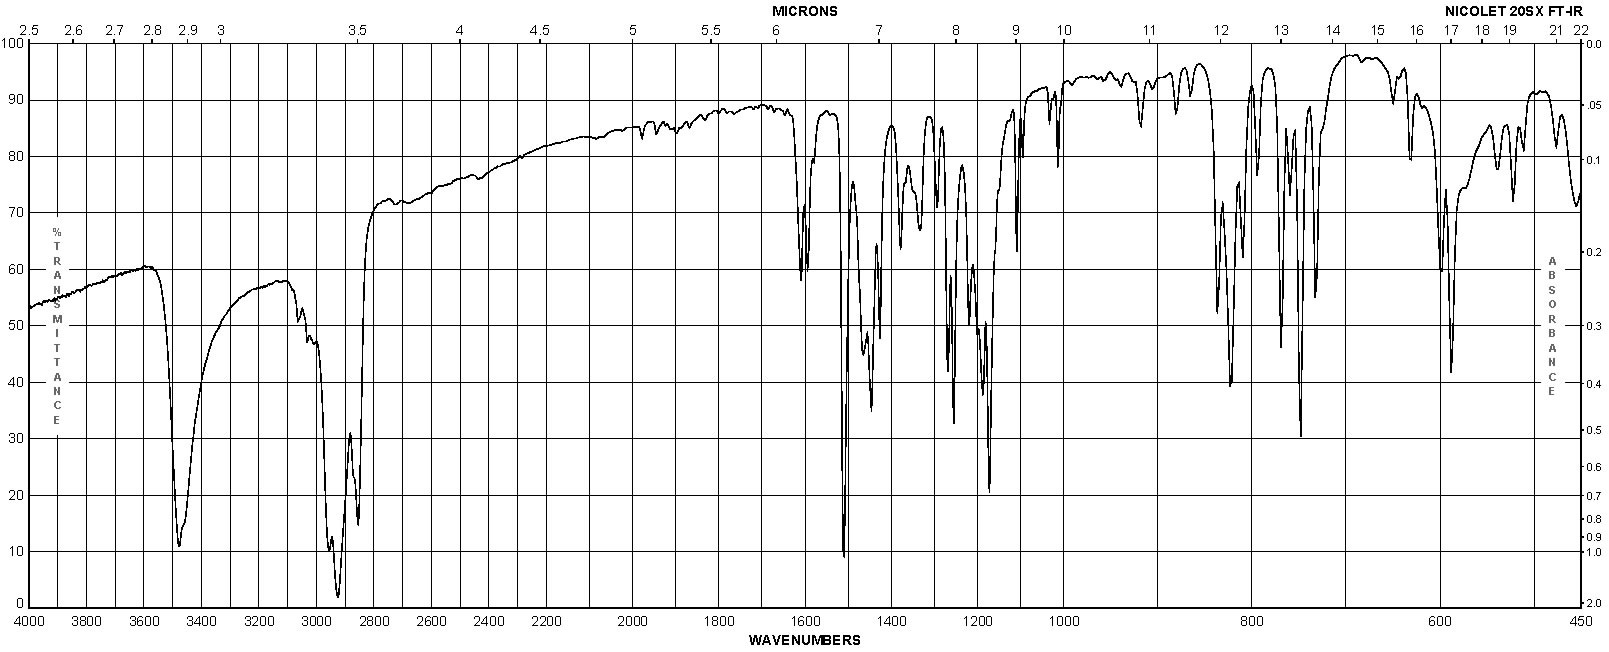 9,9-Bis (4 idrossifenil) fluorene CAS 3236-71-3 IR